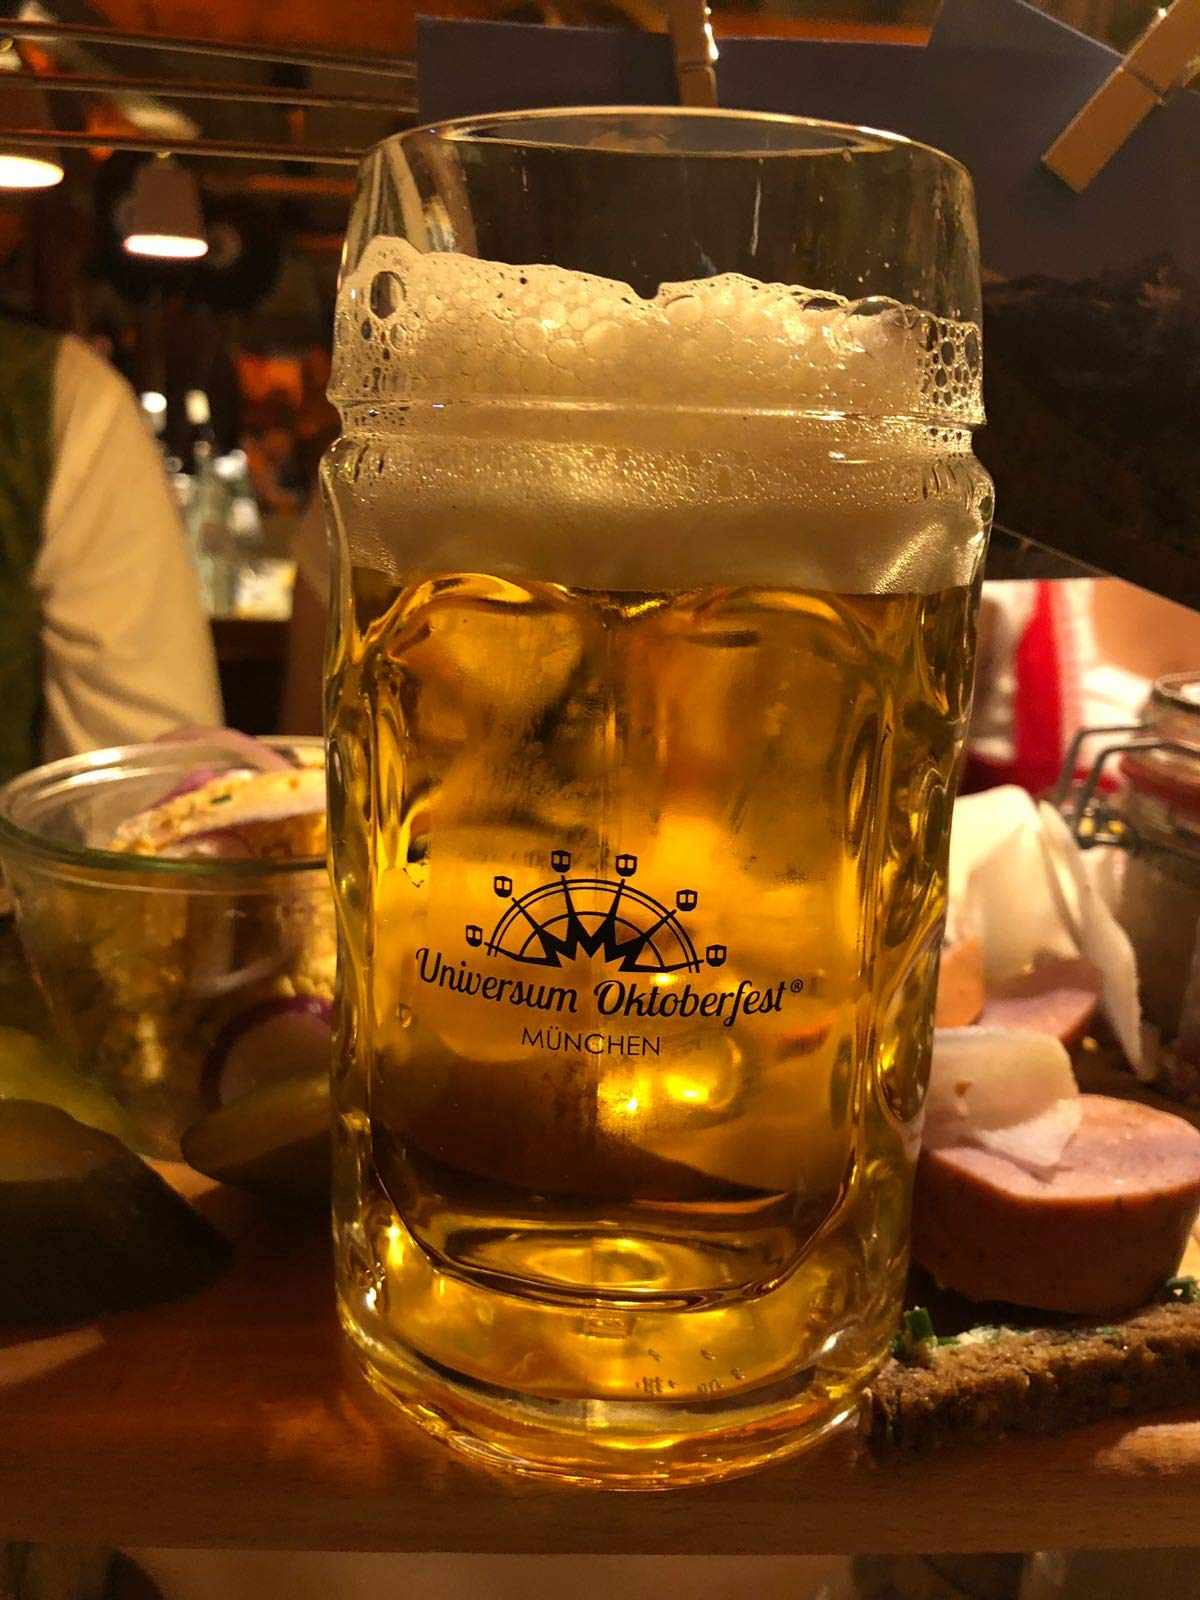 Universum Oktoberfest Beer Mug Munich Cup, Made in Germany (0,3Liter / 10.1fl oz)